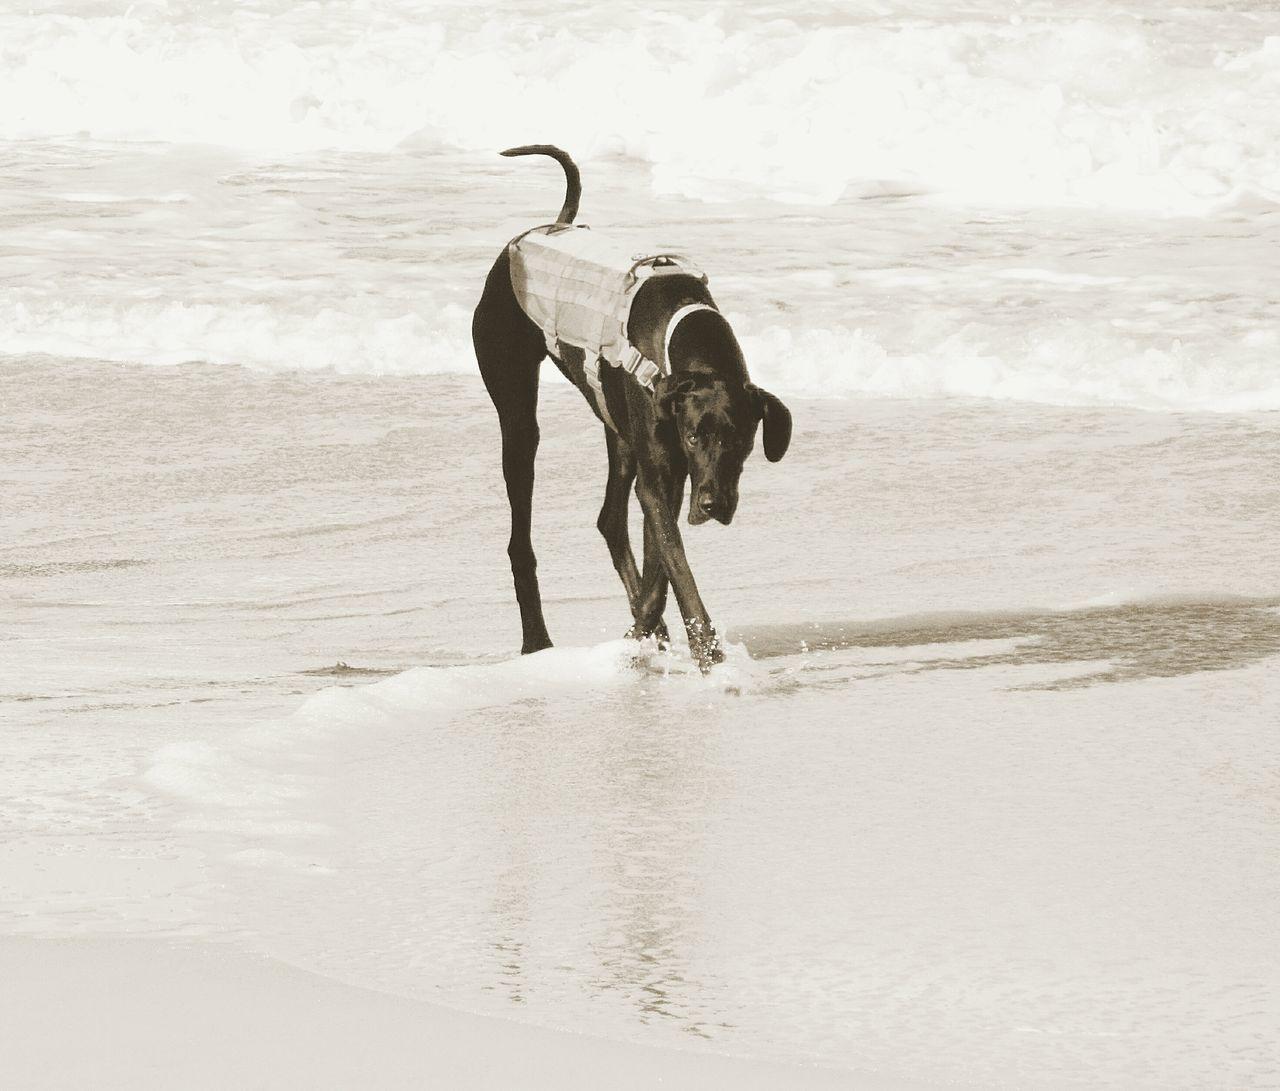 Sea Pets Beach One Animal Water Dog Domestic Animals Outdoors Mammal Nature No People Day Animal Themes Sky Sephia Dog On The Beach Dog On Beach